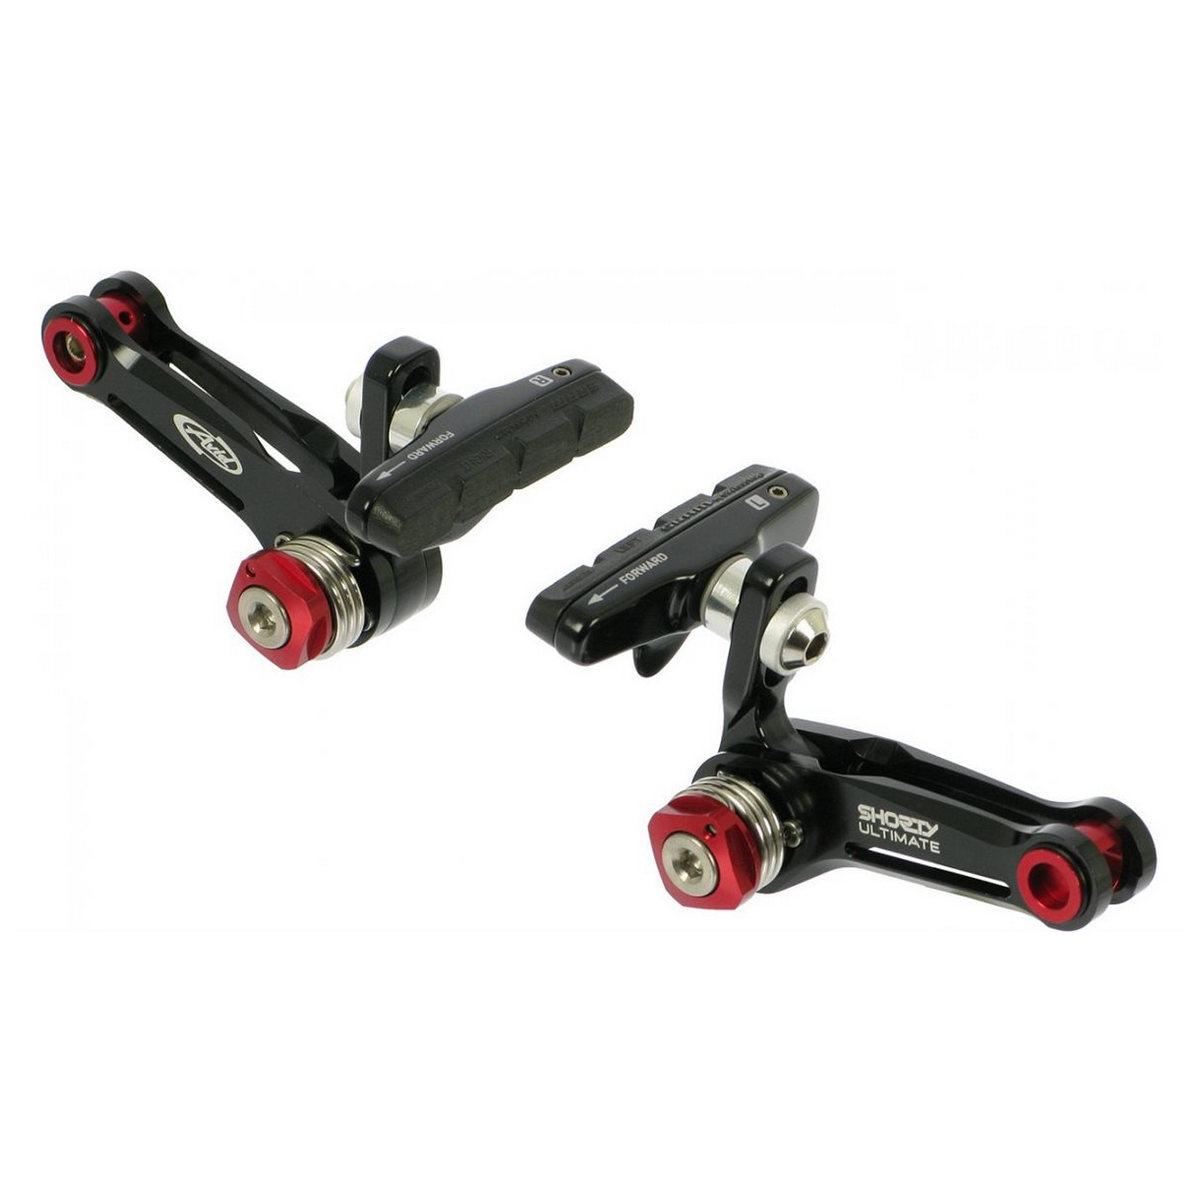 Rear cantilever brake Shorty Ultimate